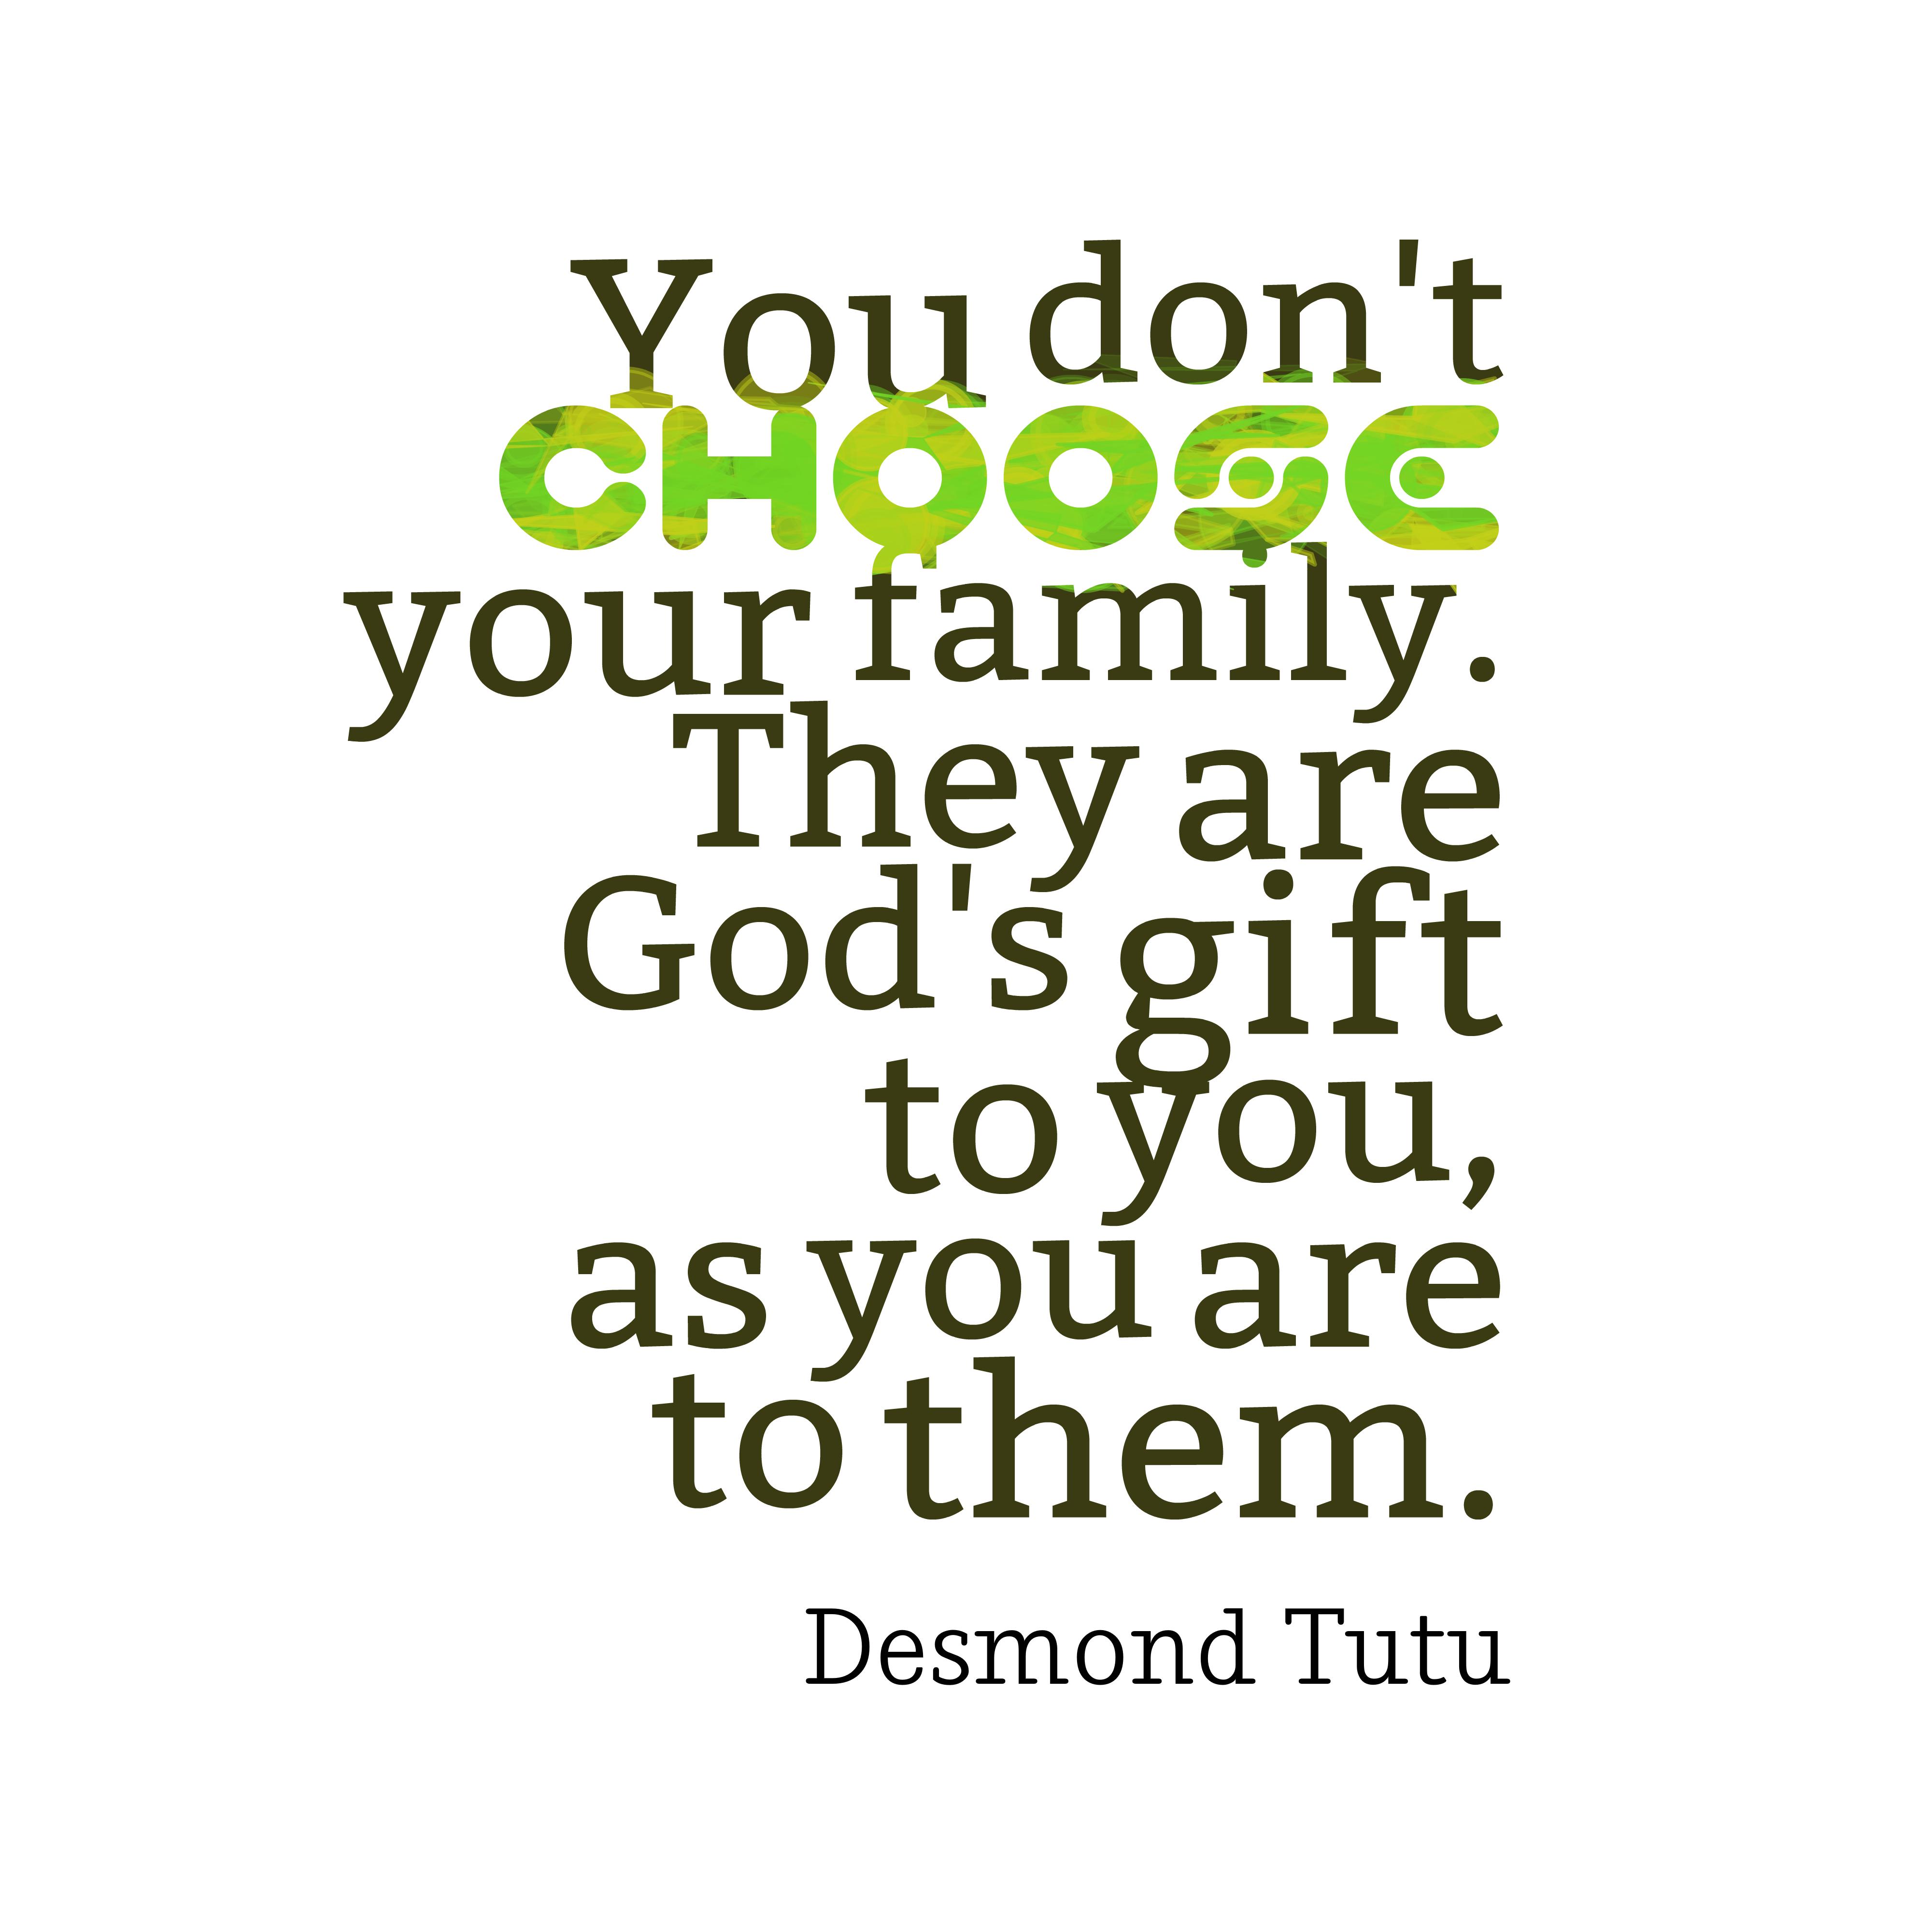 Desmond Tutu Quote About Family